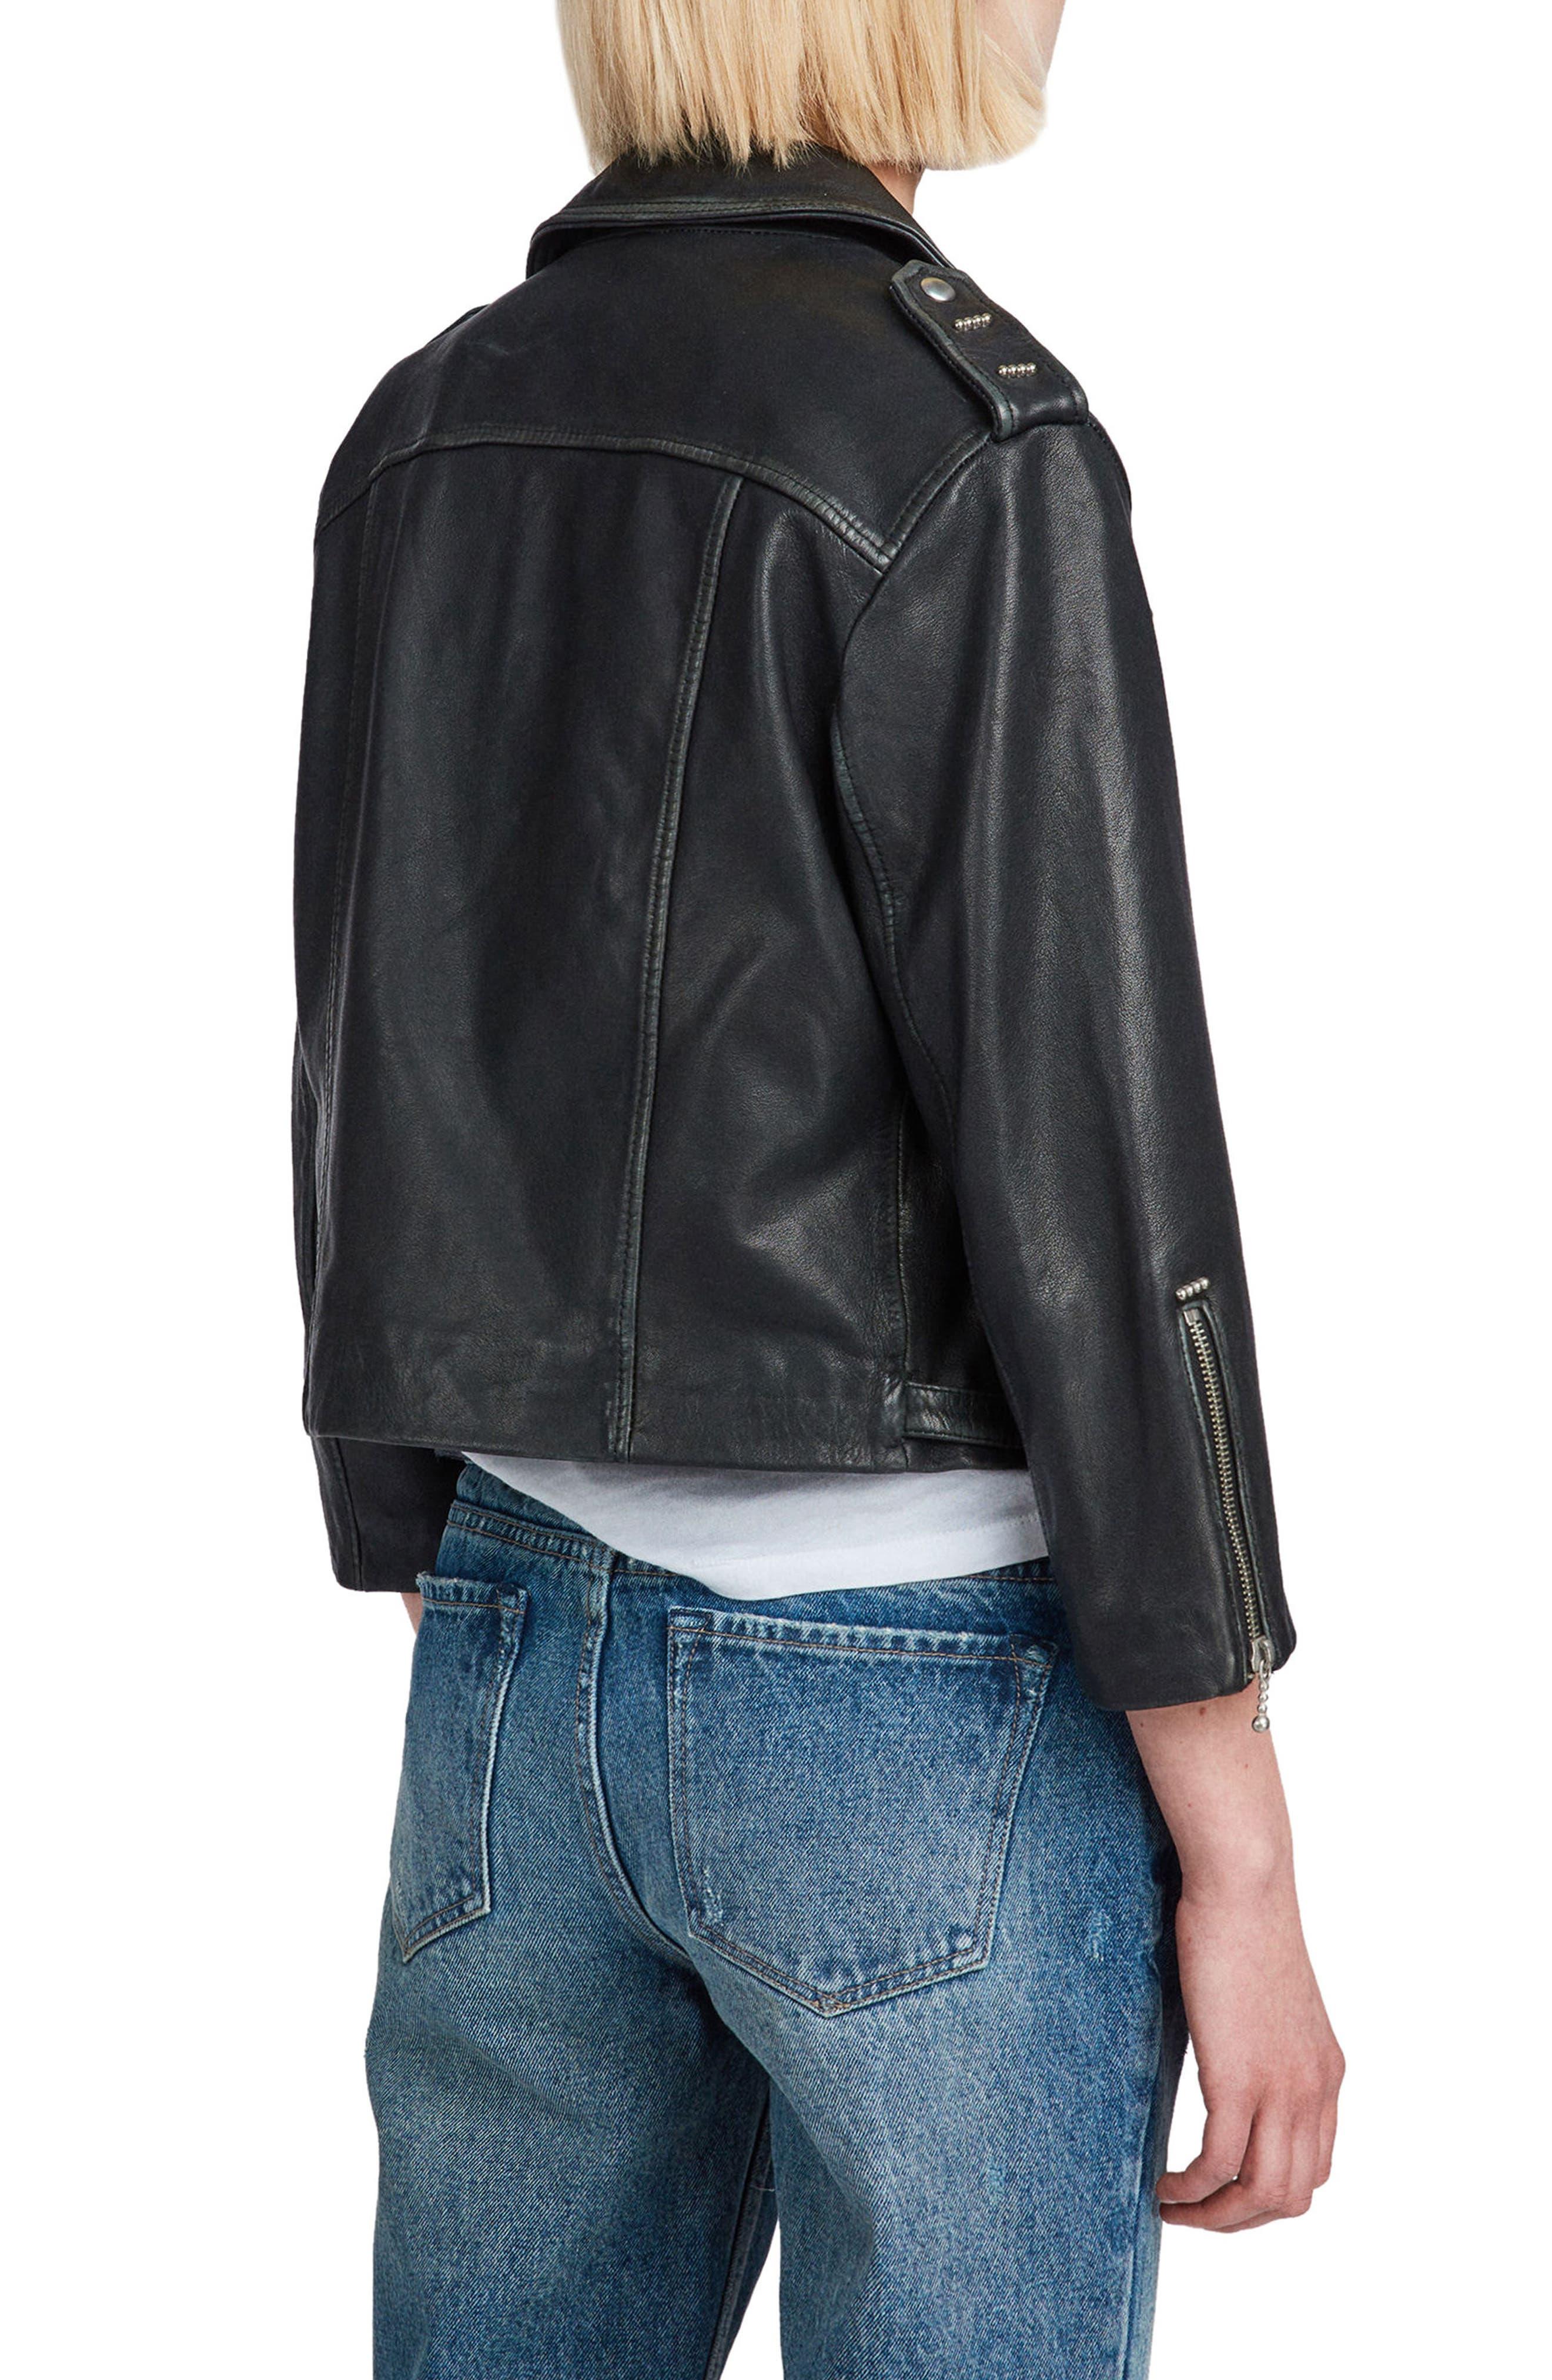 Lara Sheepskin Leather Biker Jacket,                             Alternate thumbnail 2, color,                             Black